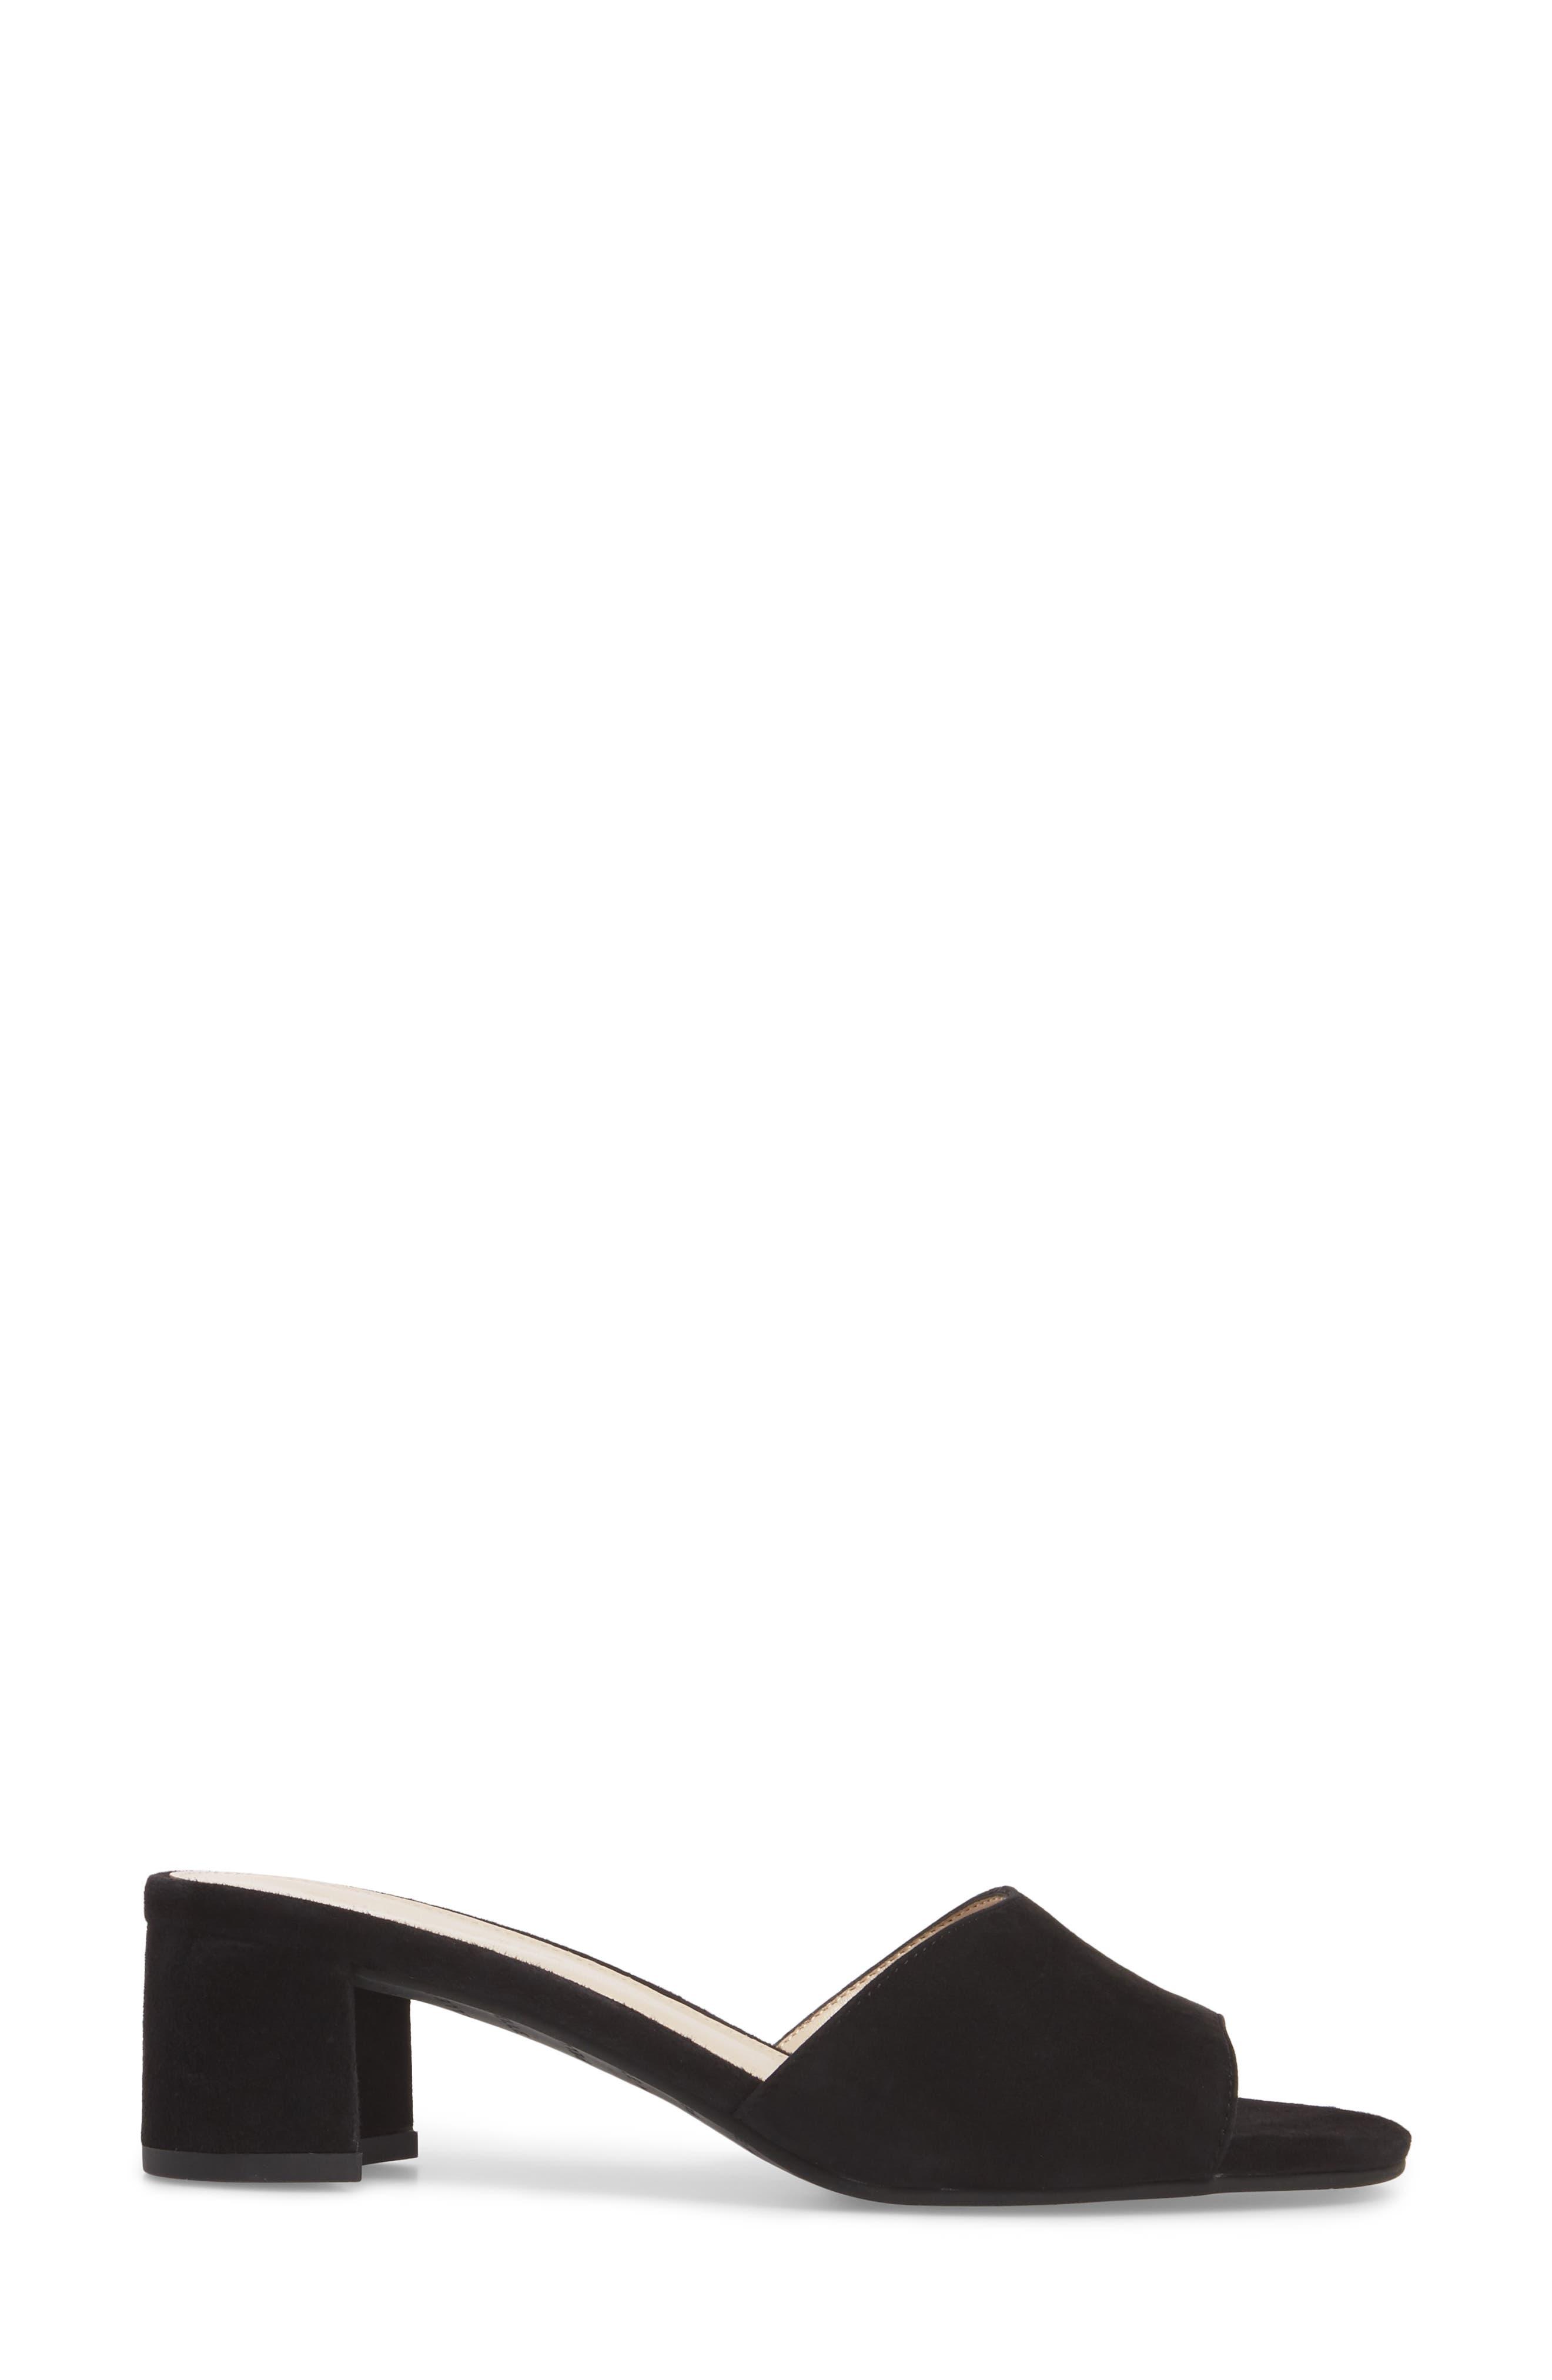 Rea Block Heel Slide Sandal,                             Alternate thumbnail 3, color,                             001